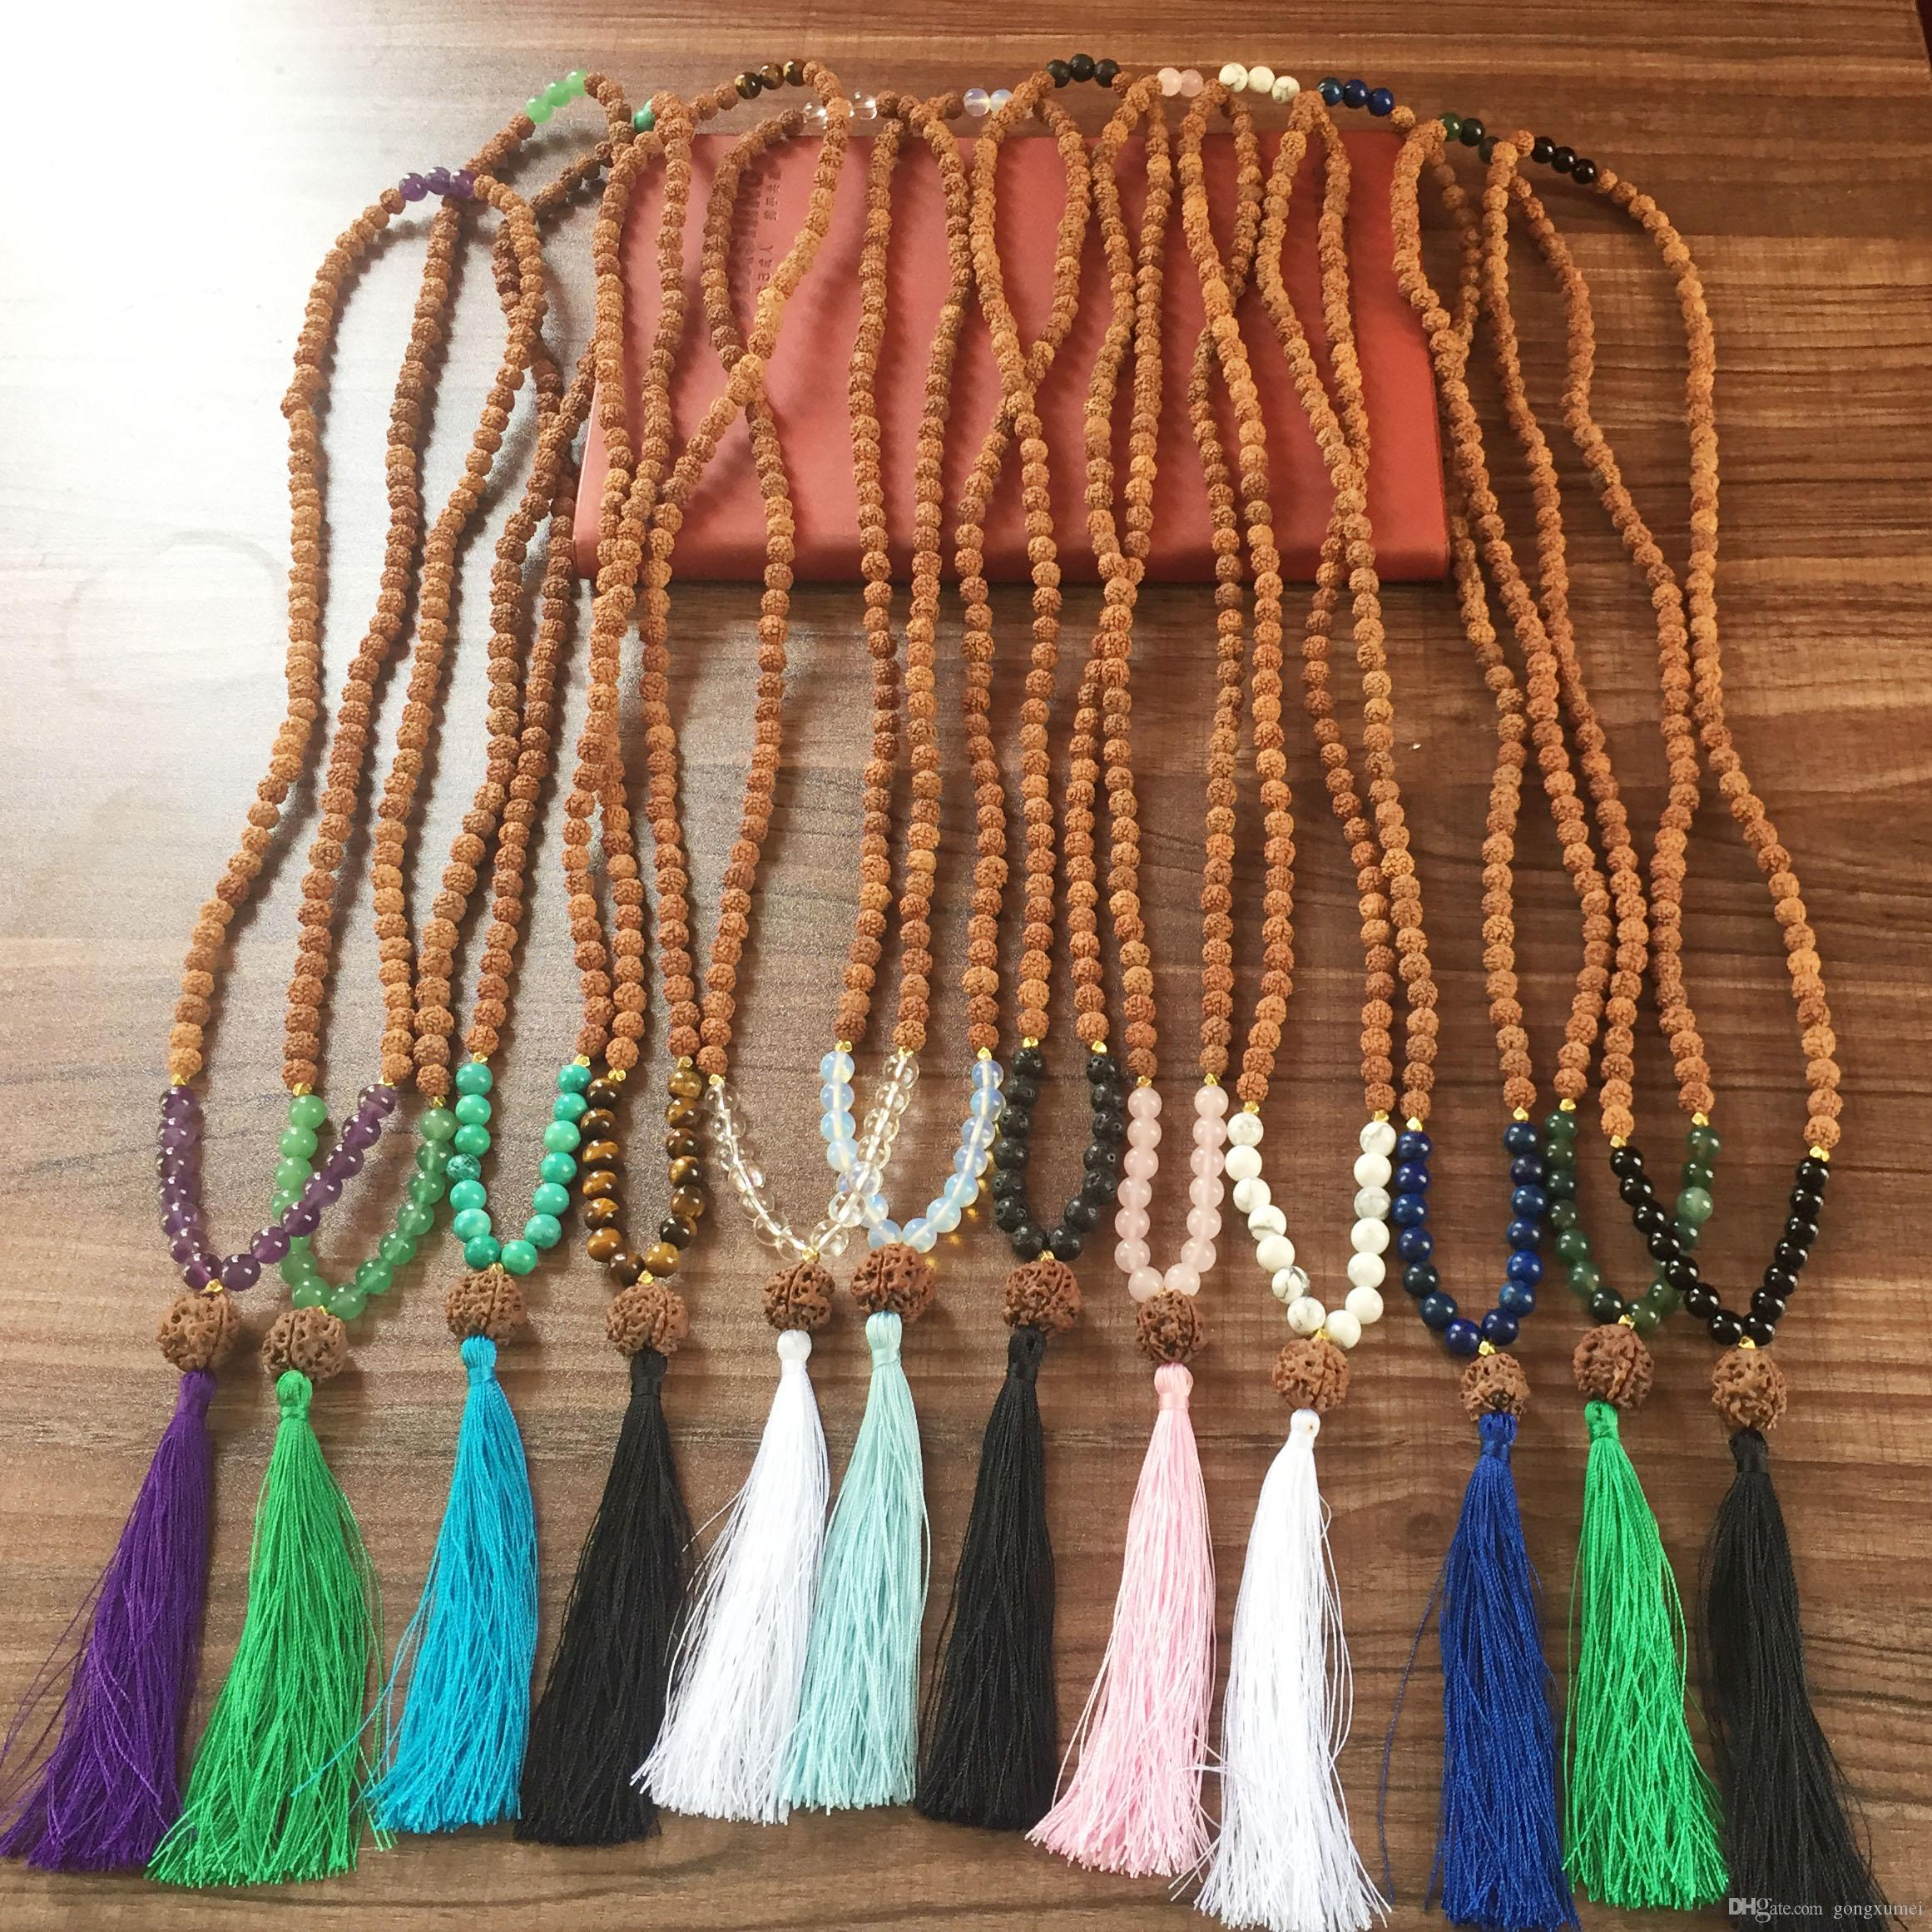 Purple Quartz 108 Mala Beads Yoga Meditation Beads Bohemian Tassel Necklace Heart Chakra Necklace Bodhi necklaces Rudraksha Prayer